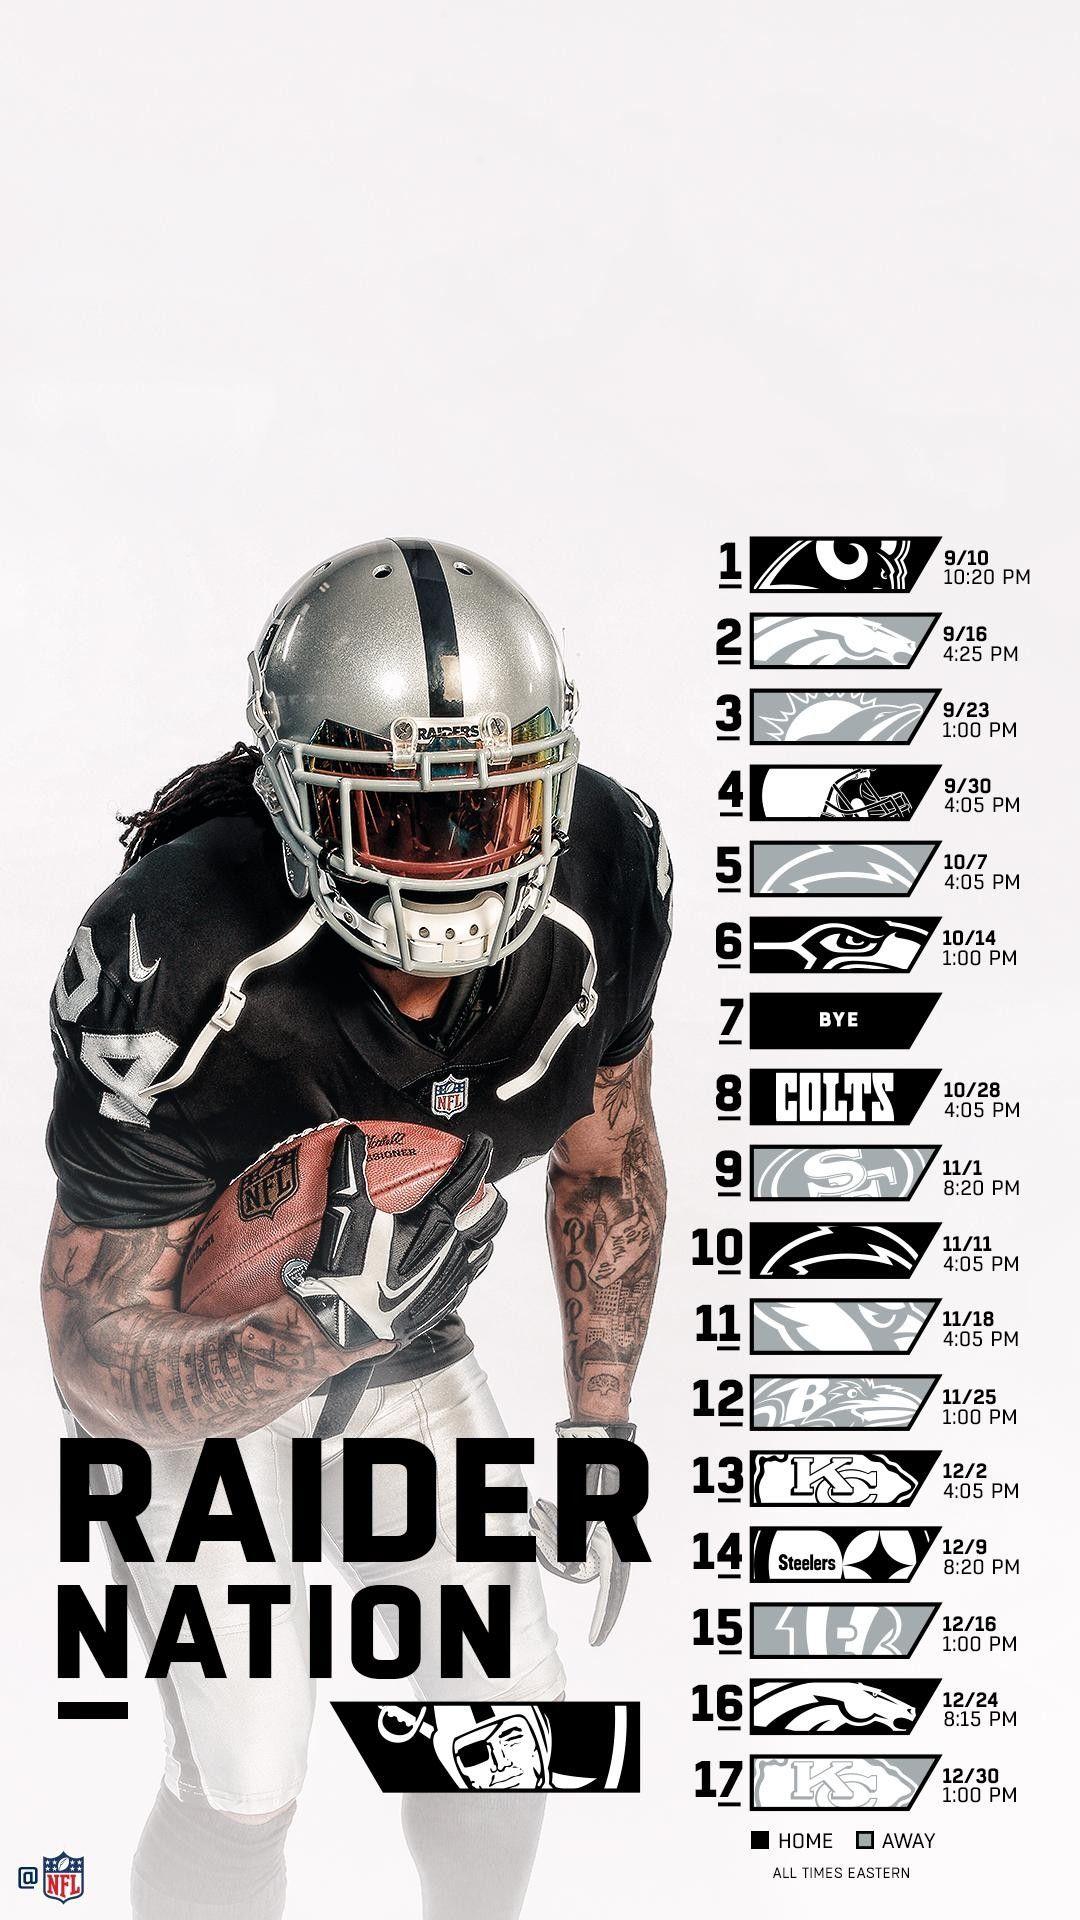 Raiders wallpaper schedule 20182019 Oakland raiders